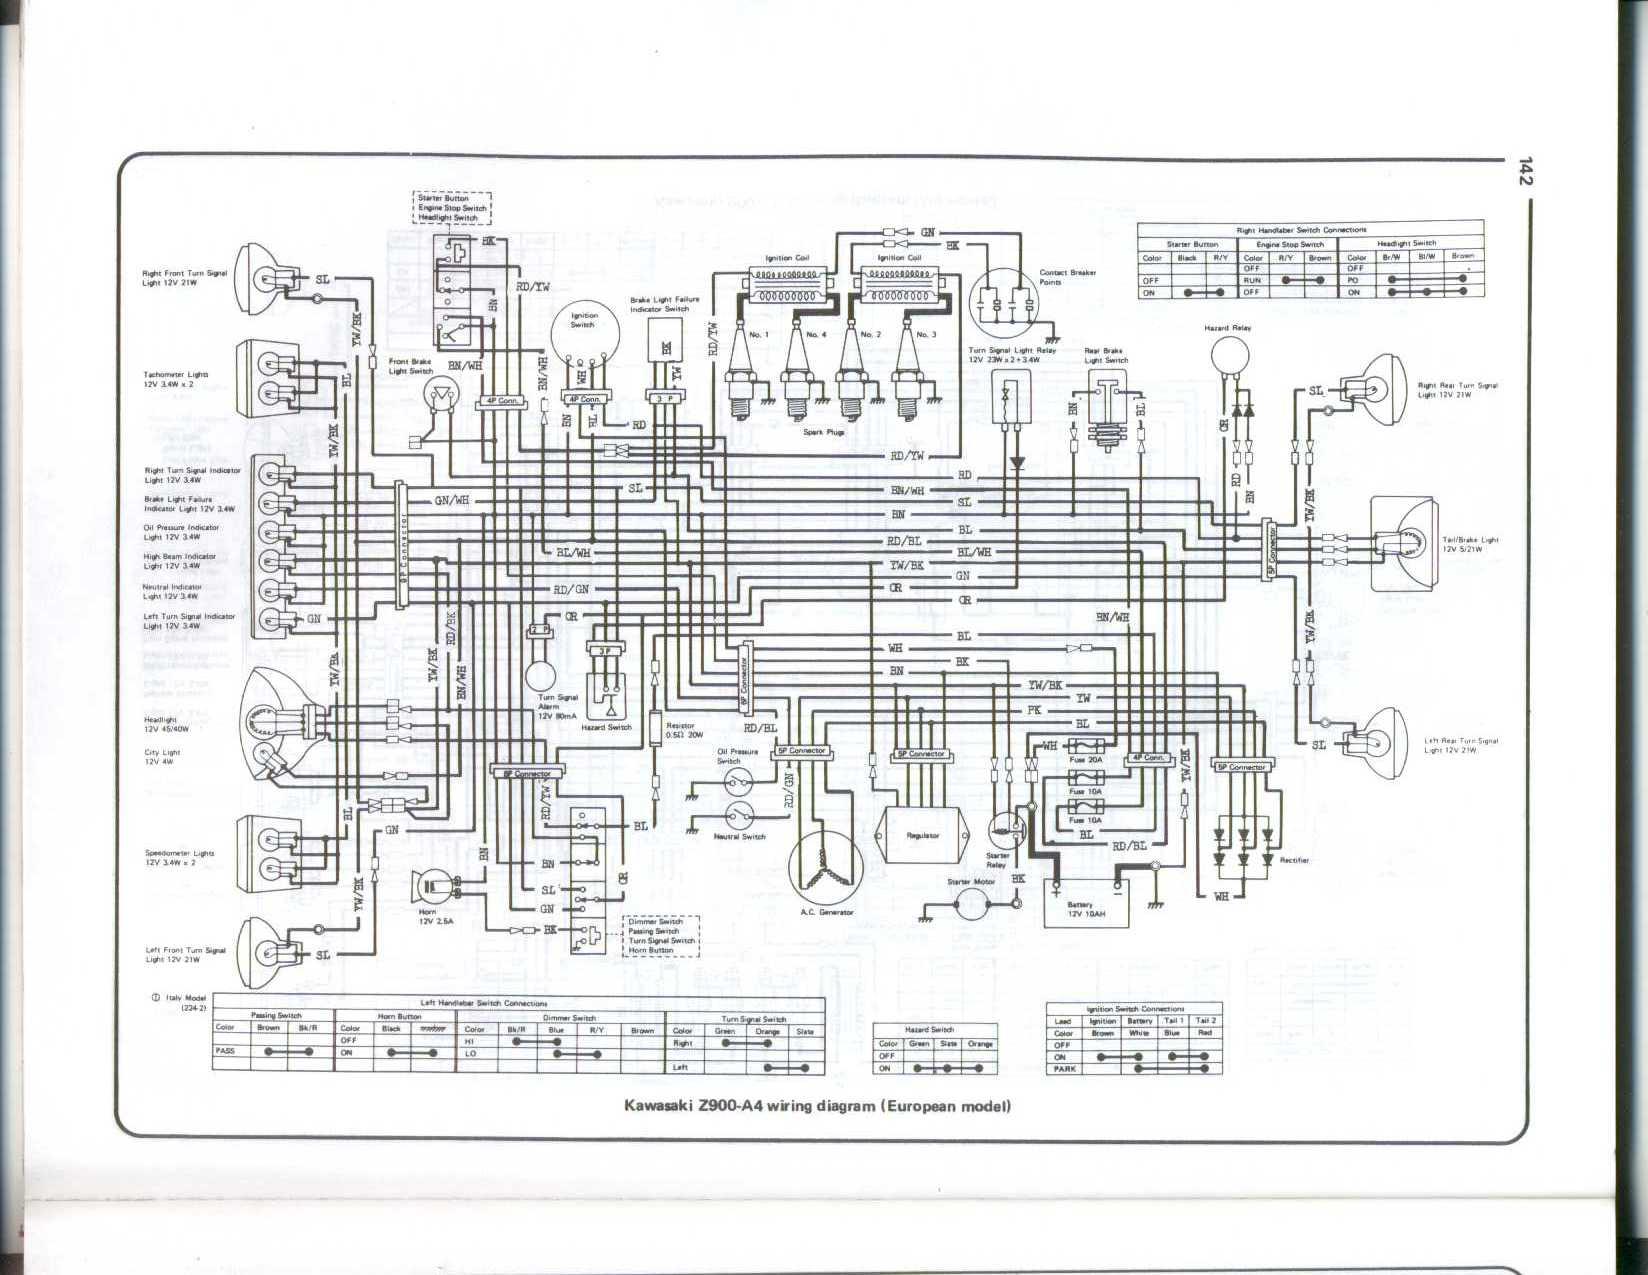 Kawasaki Z900 Wiring Diagram   Wiring Diagram on floor drain diagram, 220 fuse diagram, 220 socket diagram, 4 wire 220 diagram, 3 wire 220 outlet diagram, 220 volt diagram, troubleshooting diagram, 220 plug diagram,